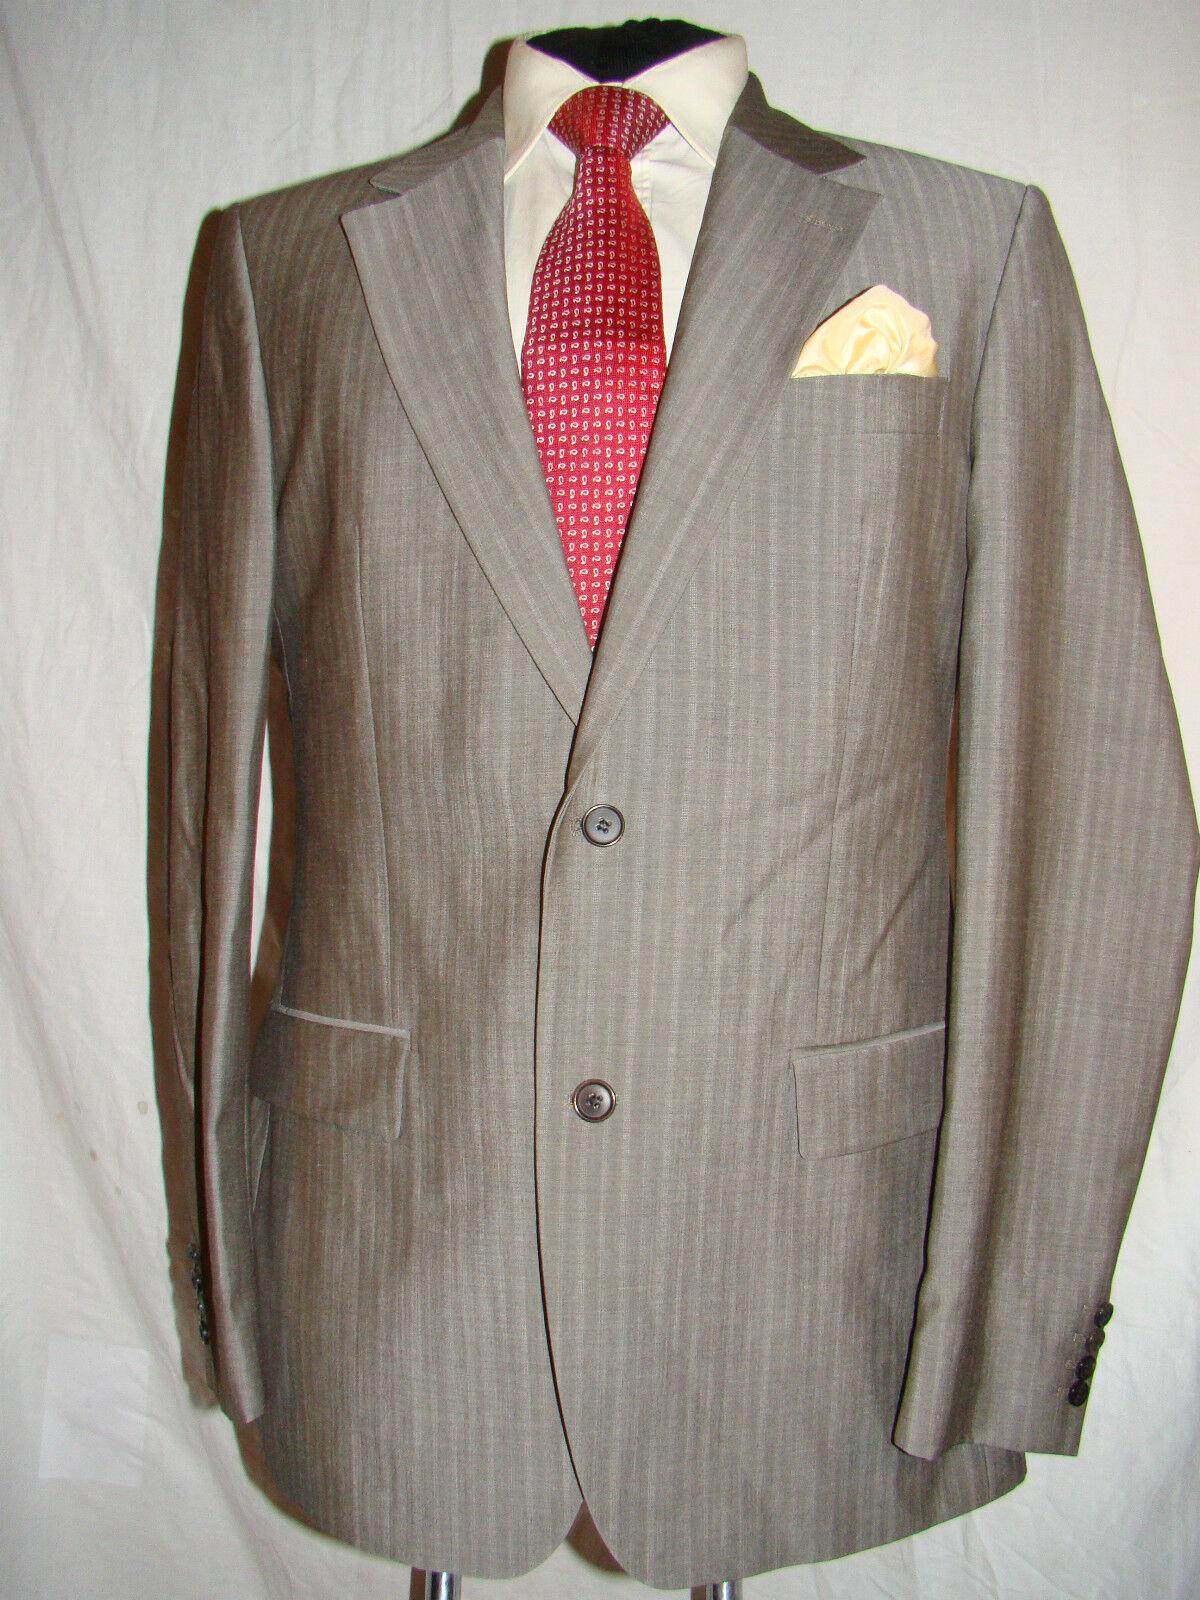 Hugo à Boss (pignon / Vegas) à Hugo rayures gris fab Designer Veste de Costume UK 42L EU 52L 6cce00